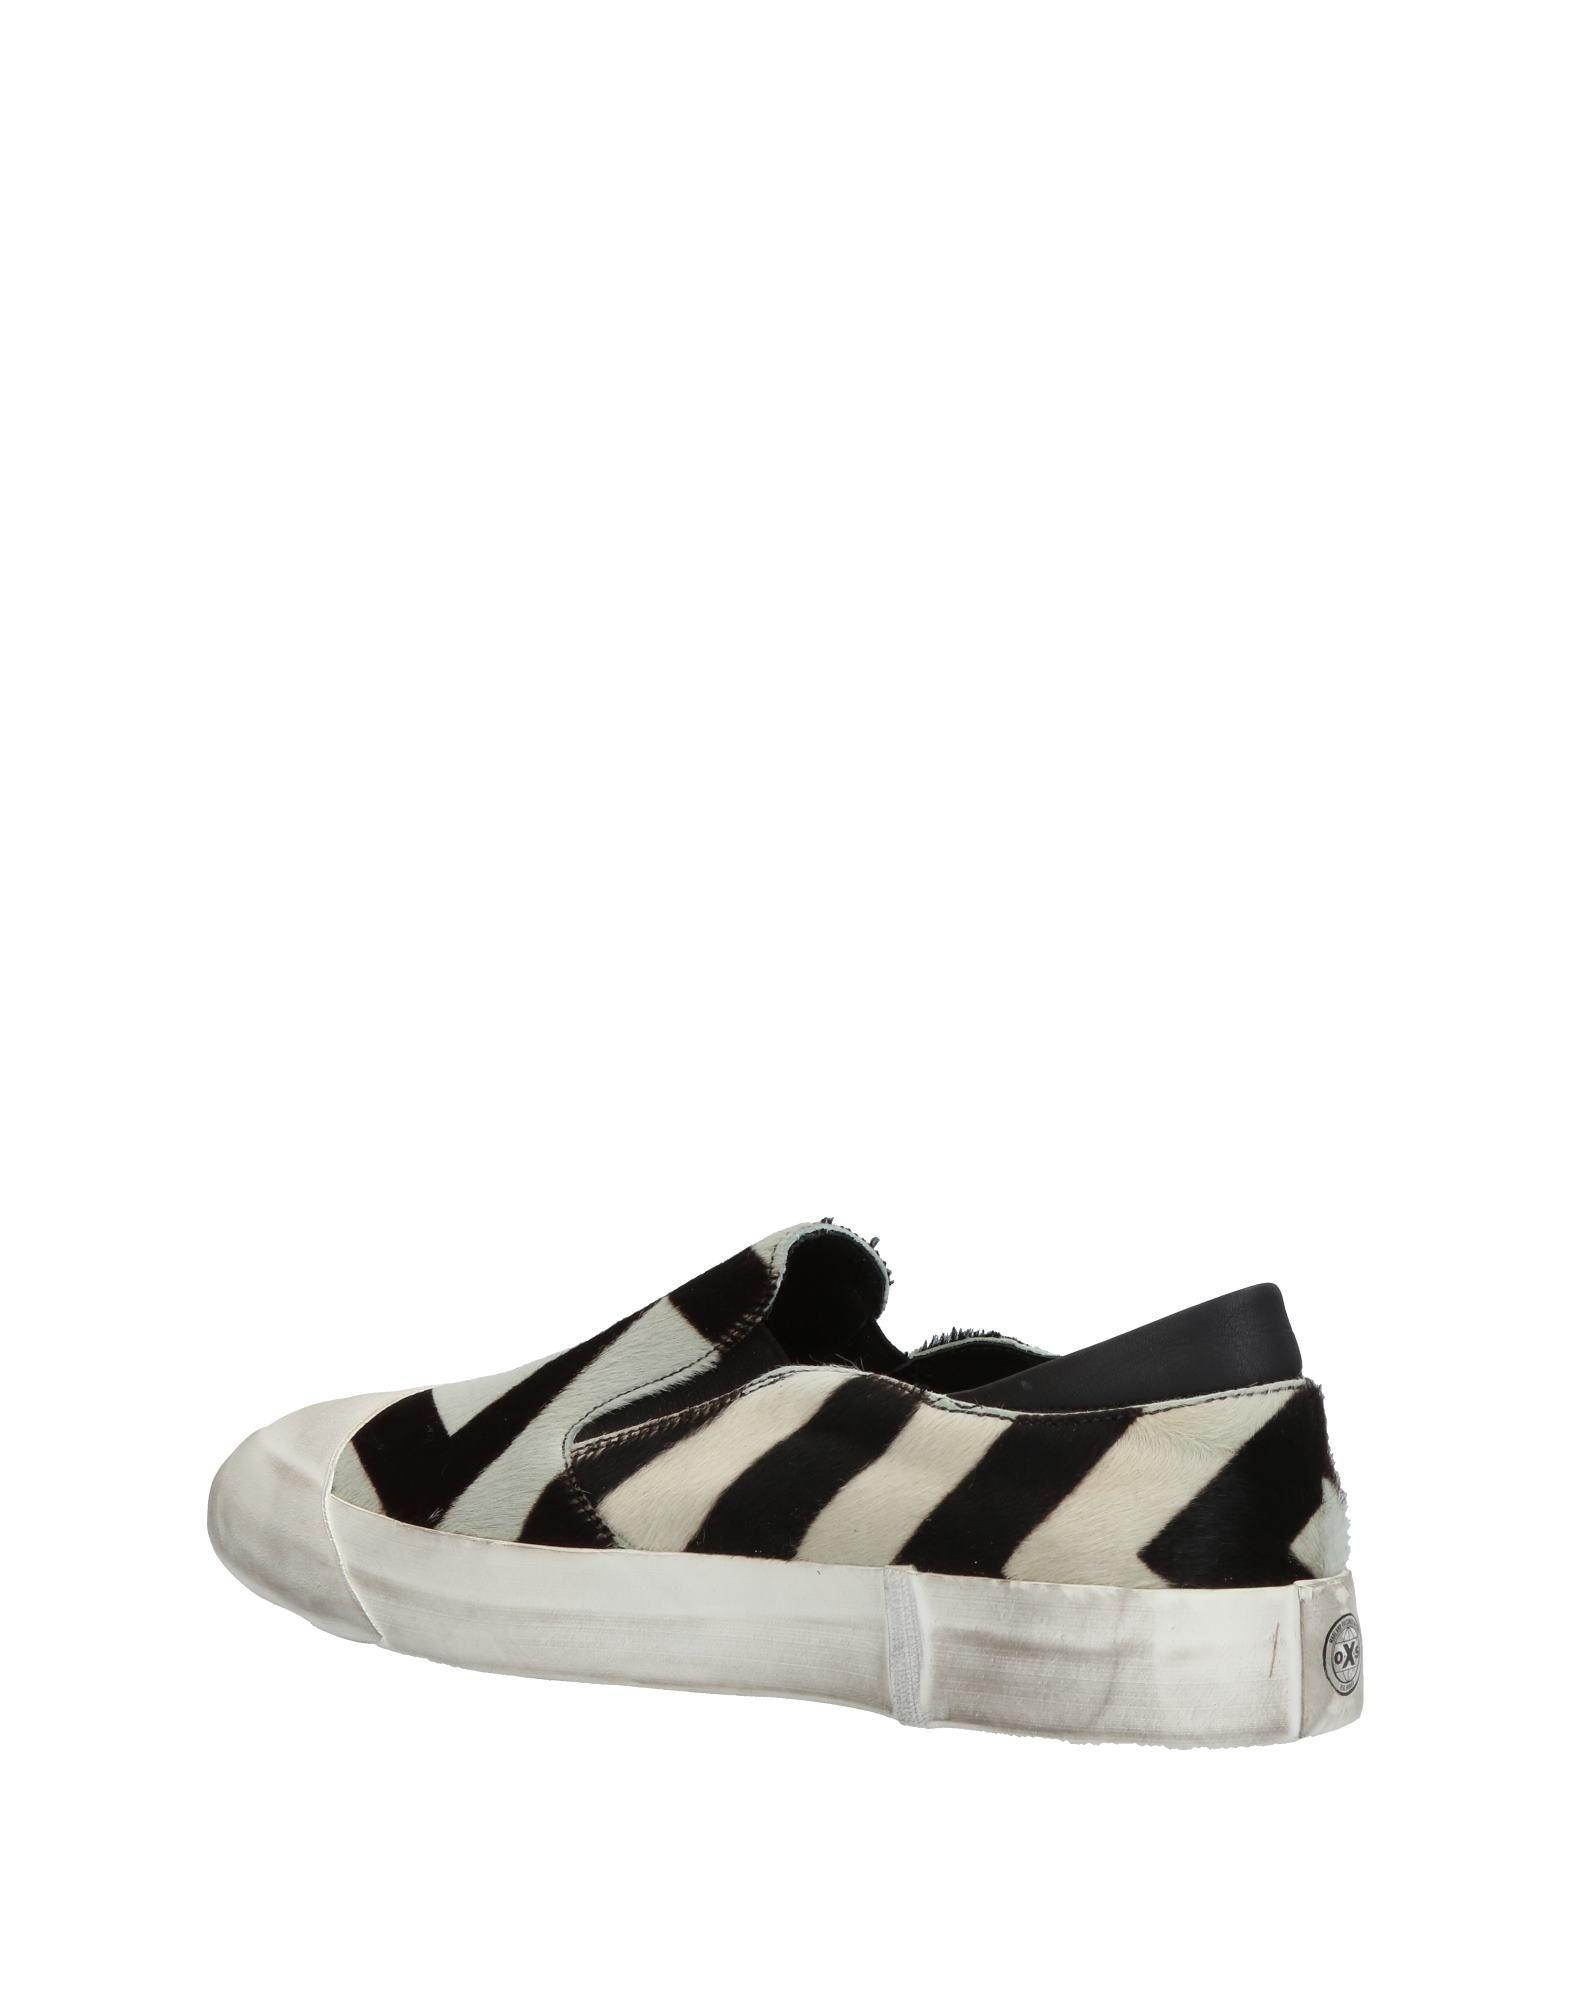 O.X.S. Sneakers Gute Damen  11338966HU Gute Sneakers Qualität beliebte Schuhe c5822f